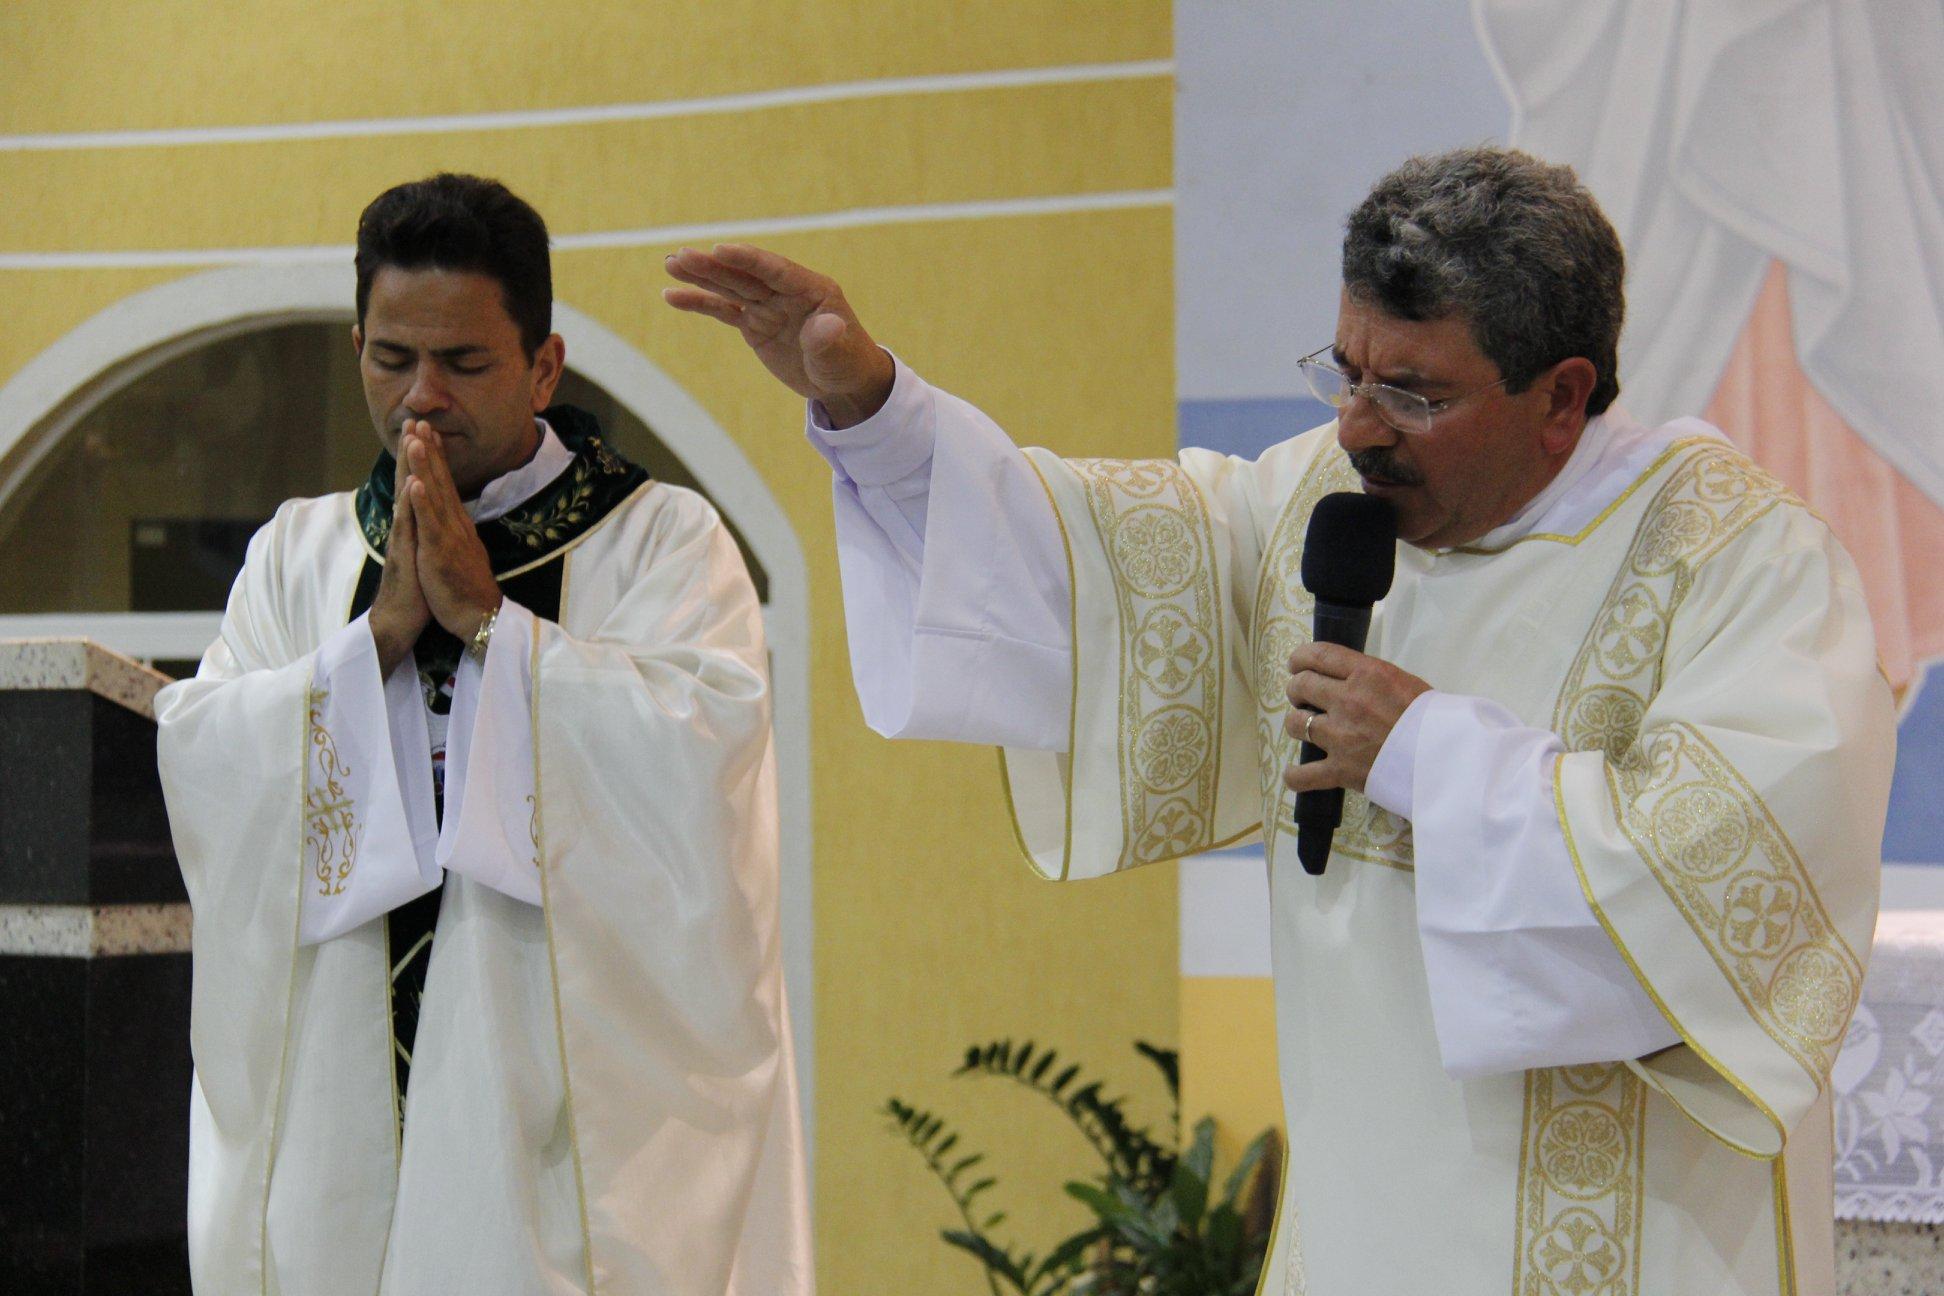 Missa de acolhida do Diácono José Valdir